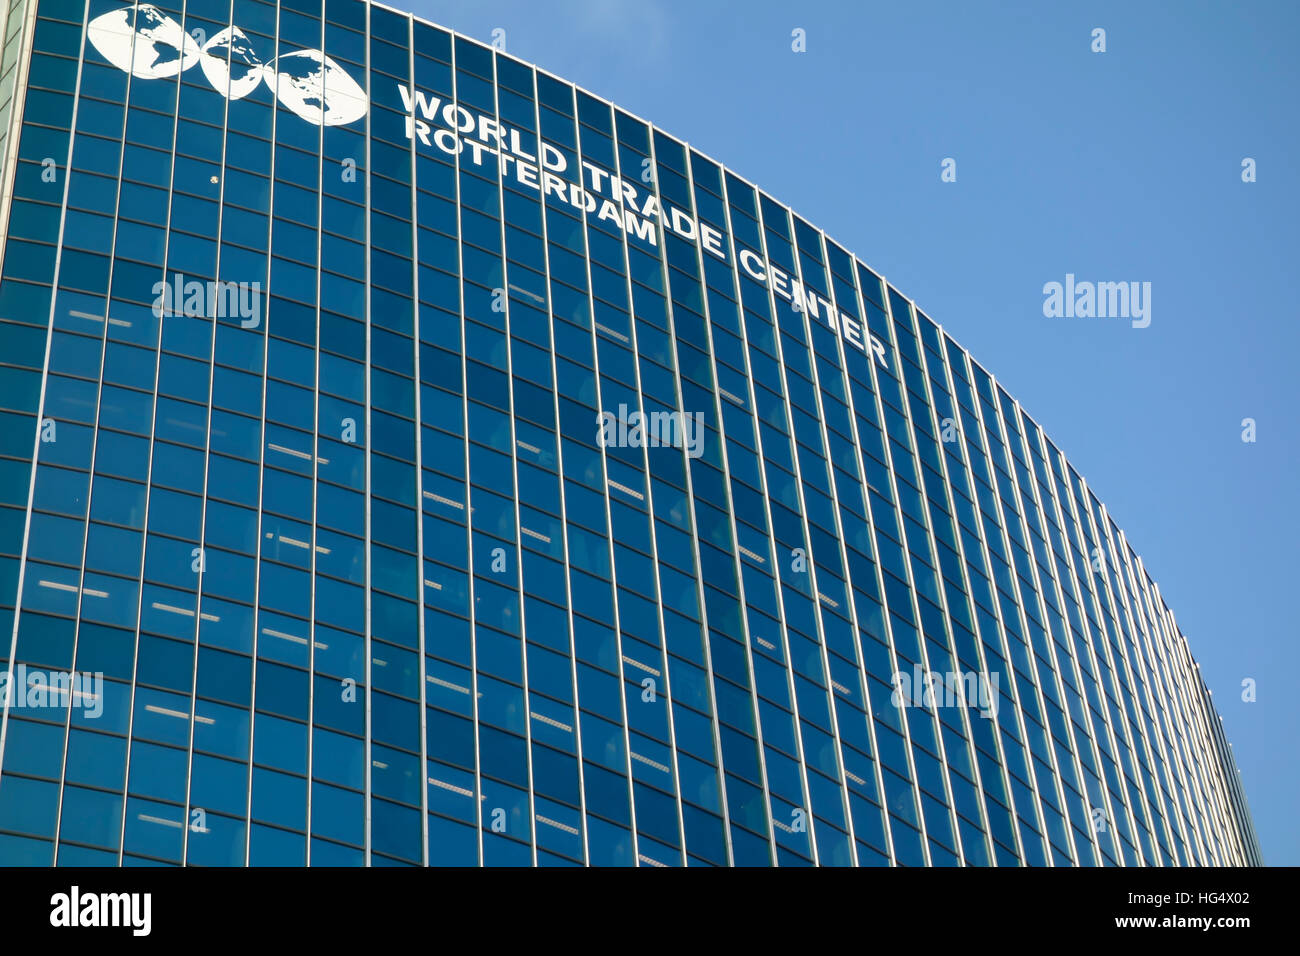 World trade center Rotterdam, Beurs, Rotterdam - Stock Image